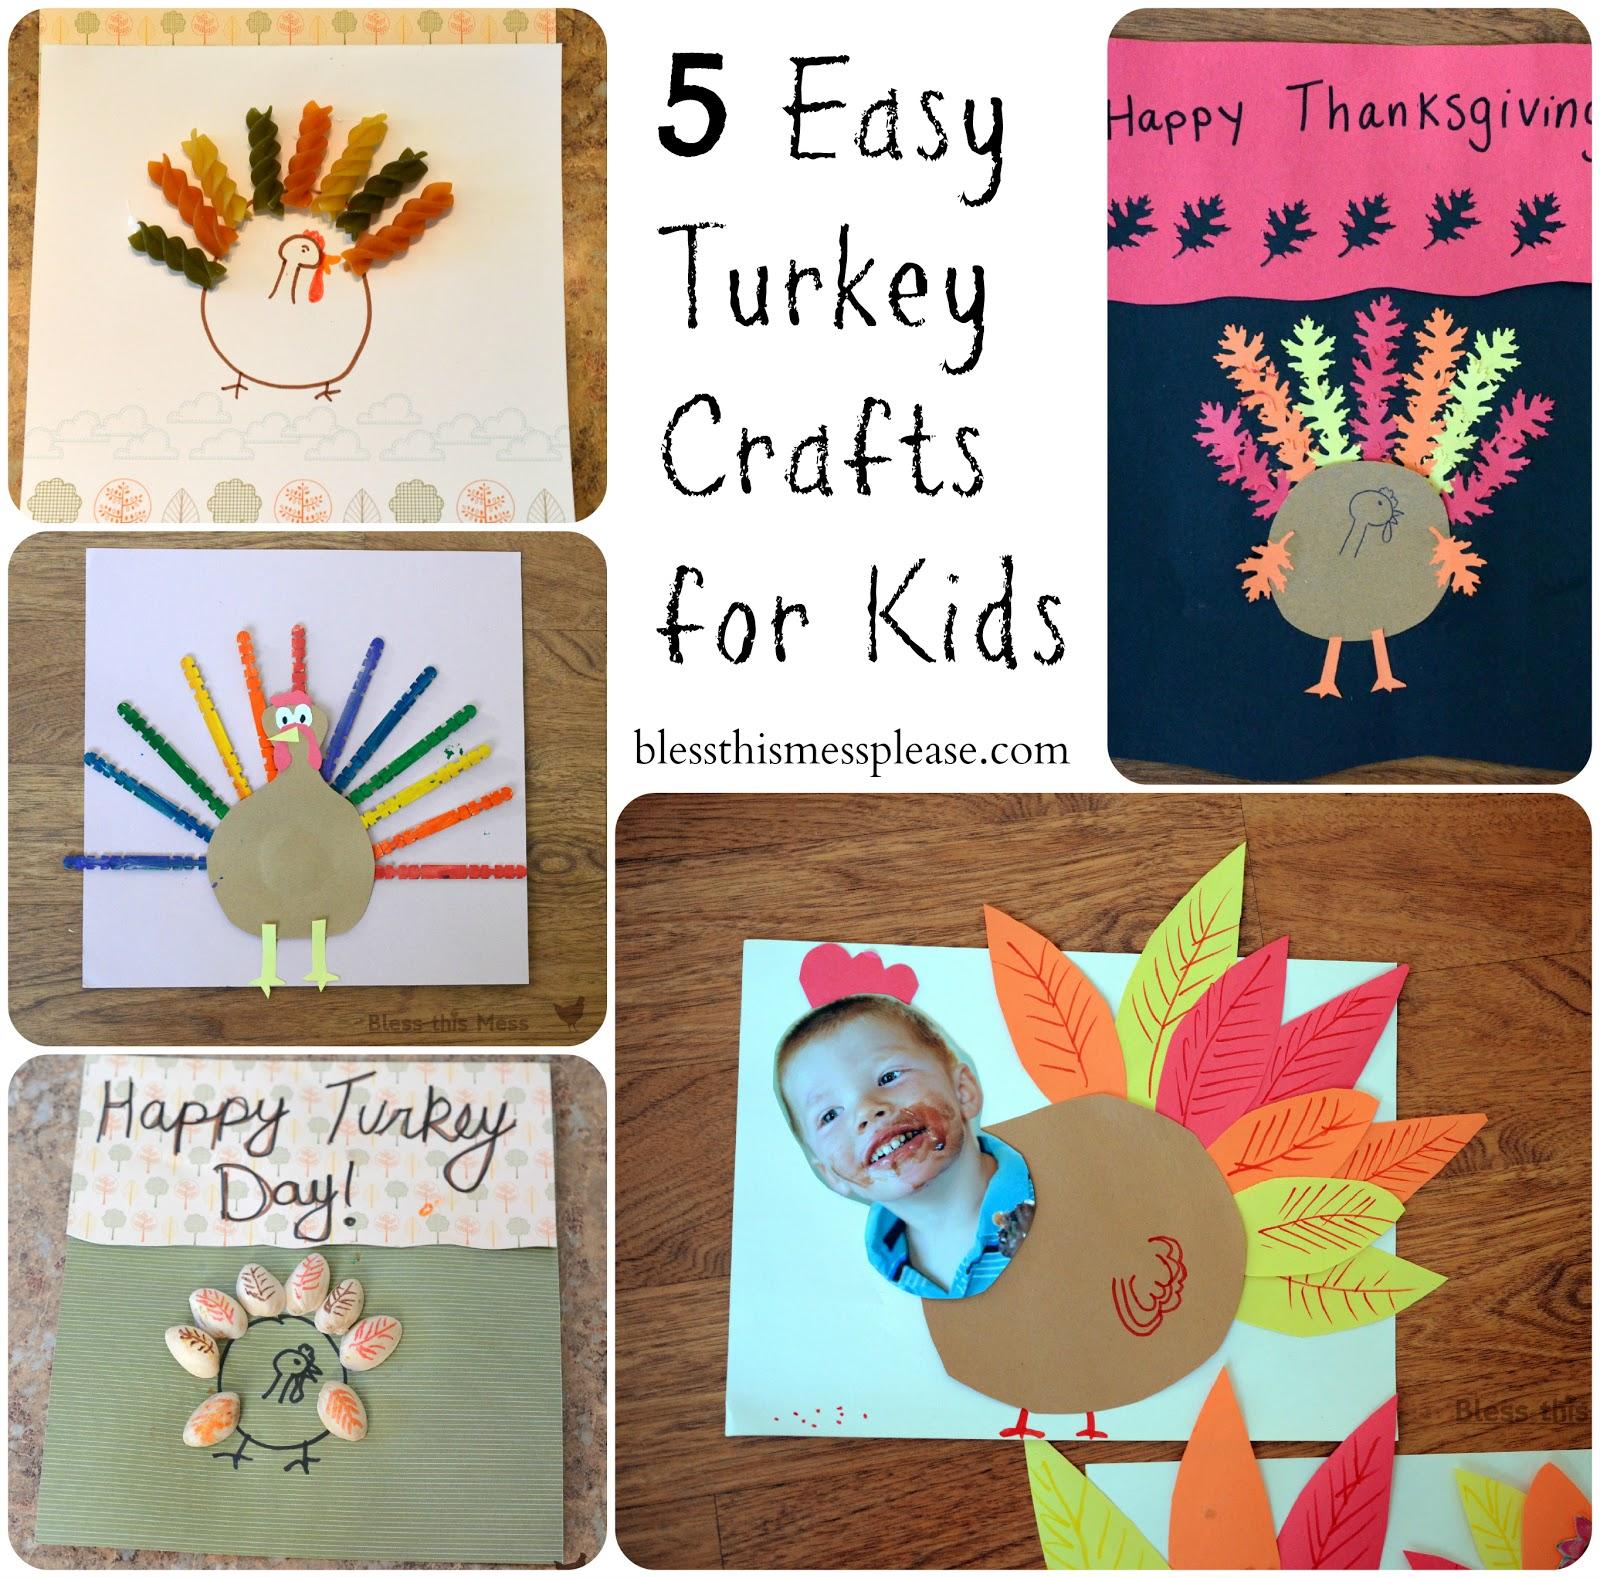 5 Easy Turkey Crafts For Kids